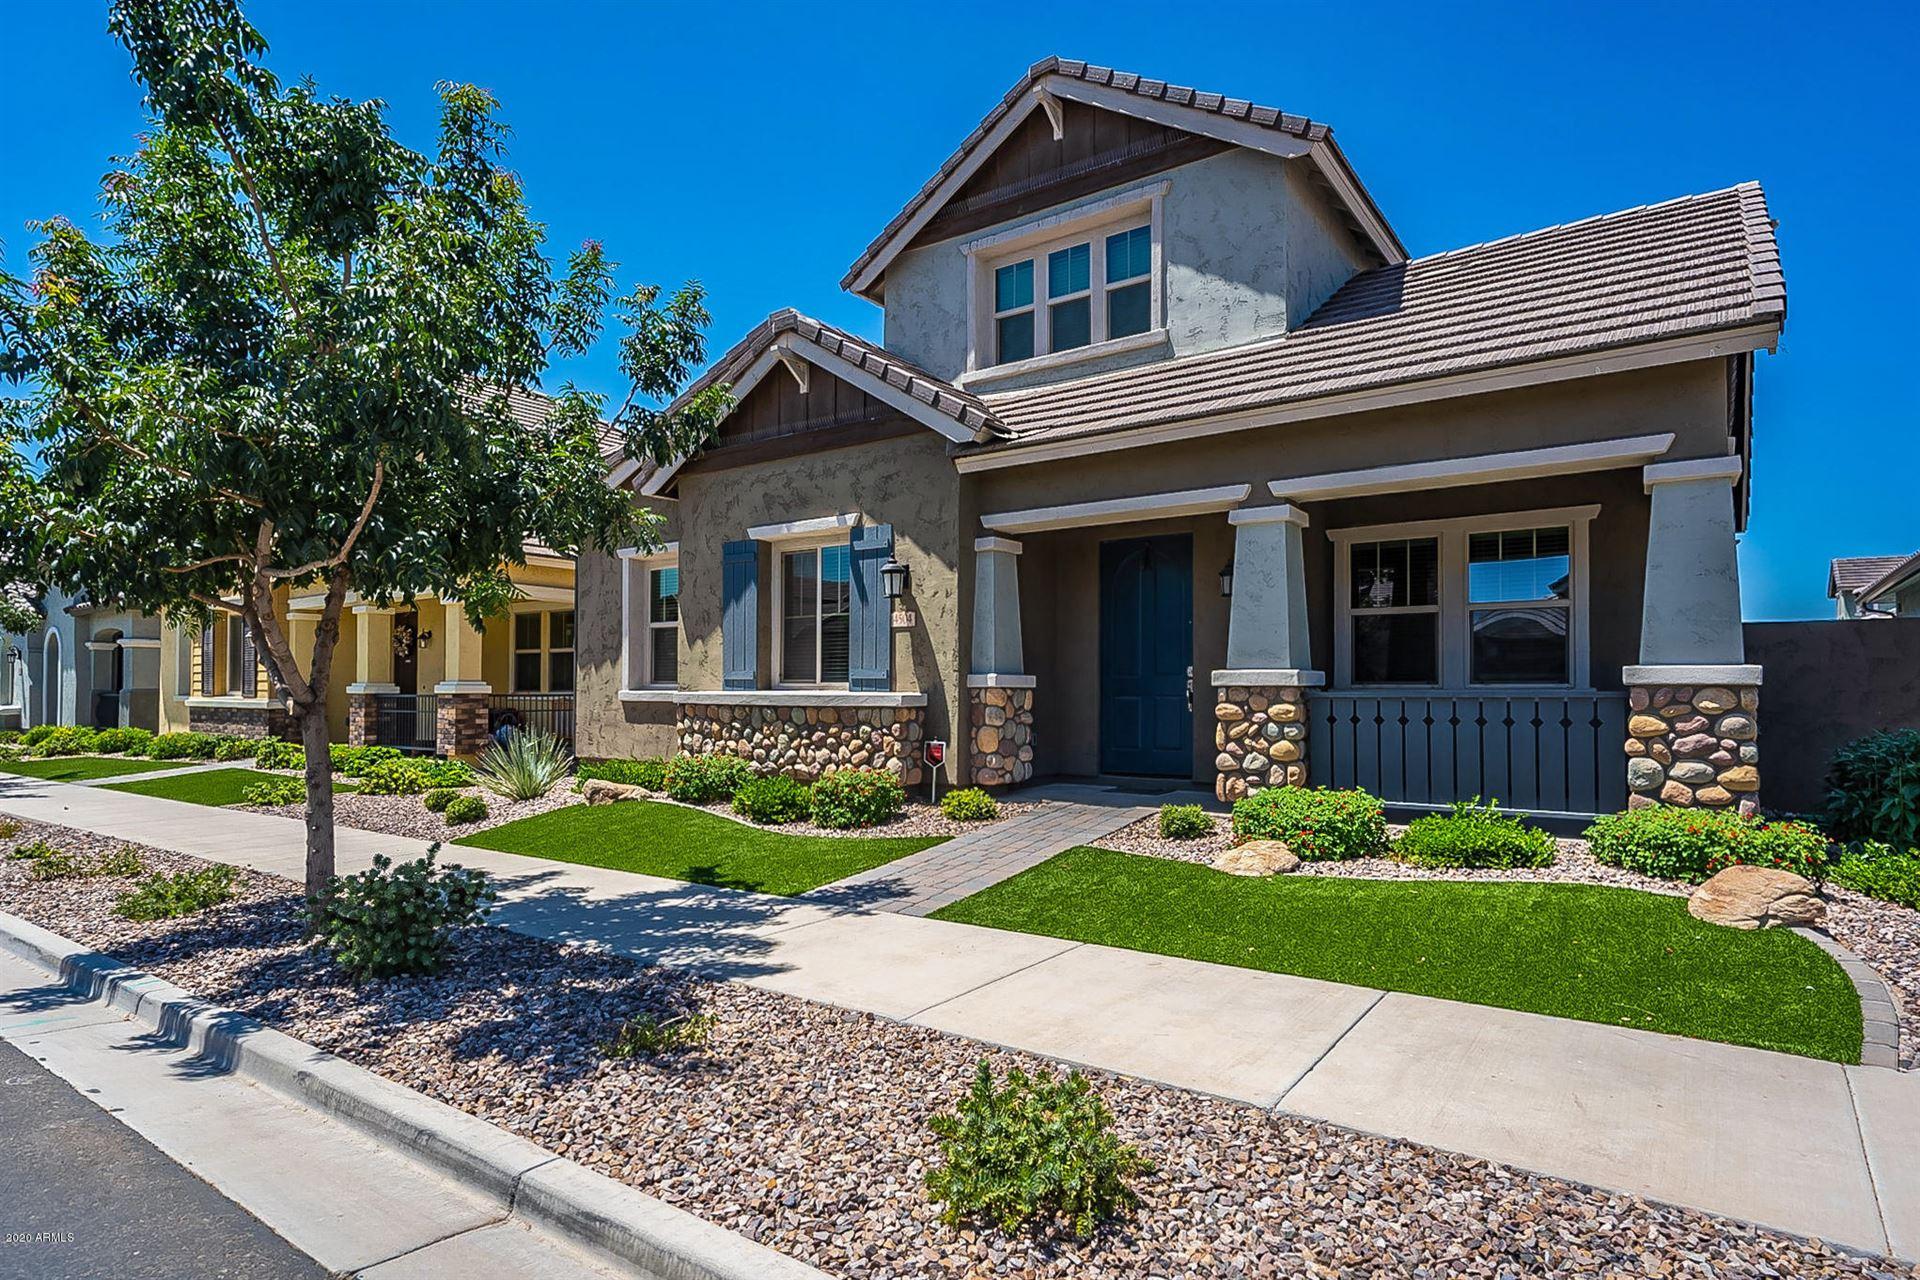 4504 E BETHENA Street, Gilbert, AZ 85295 - #: 6101119